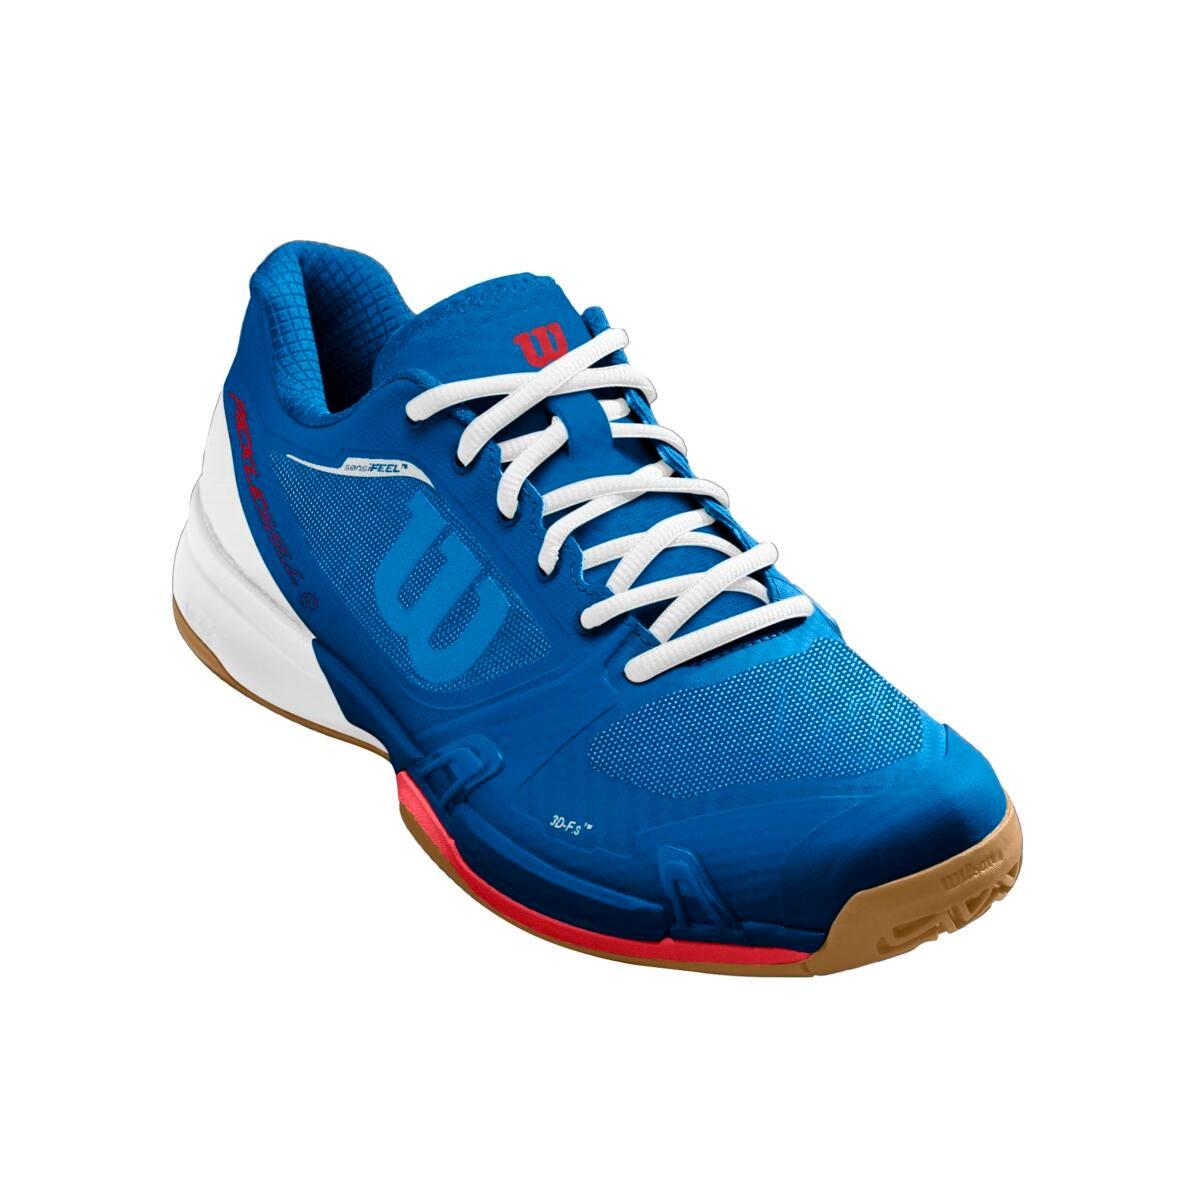 Rush Pro 2.5 Pickleball Shoe